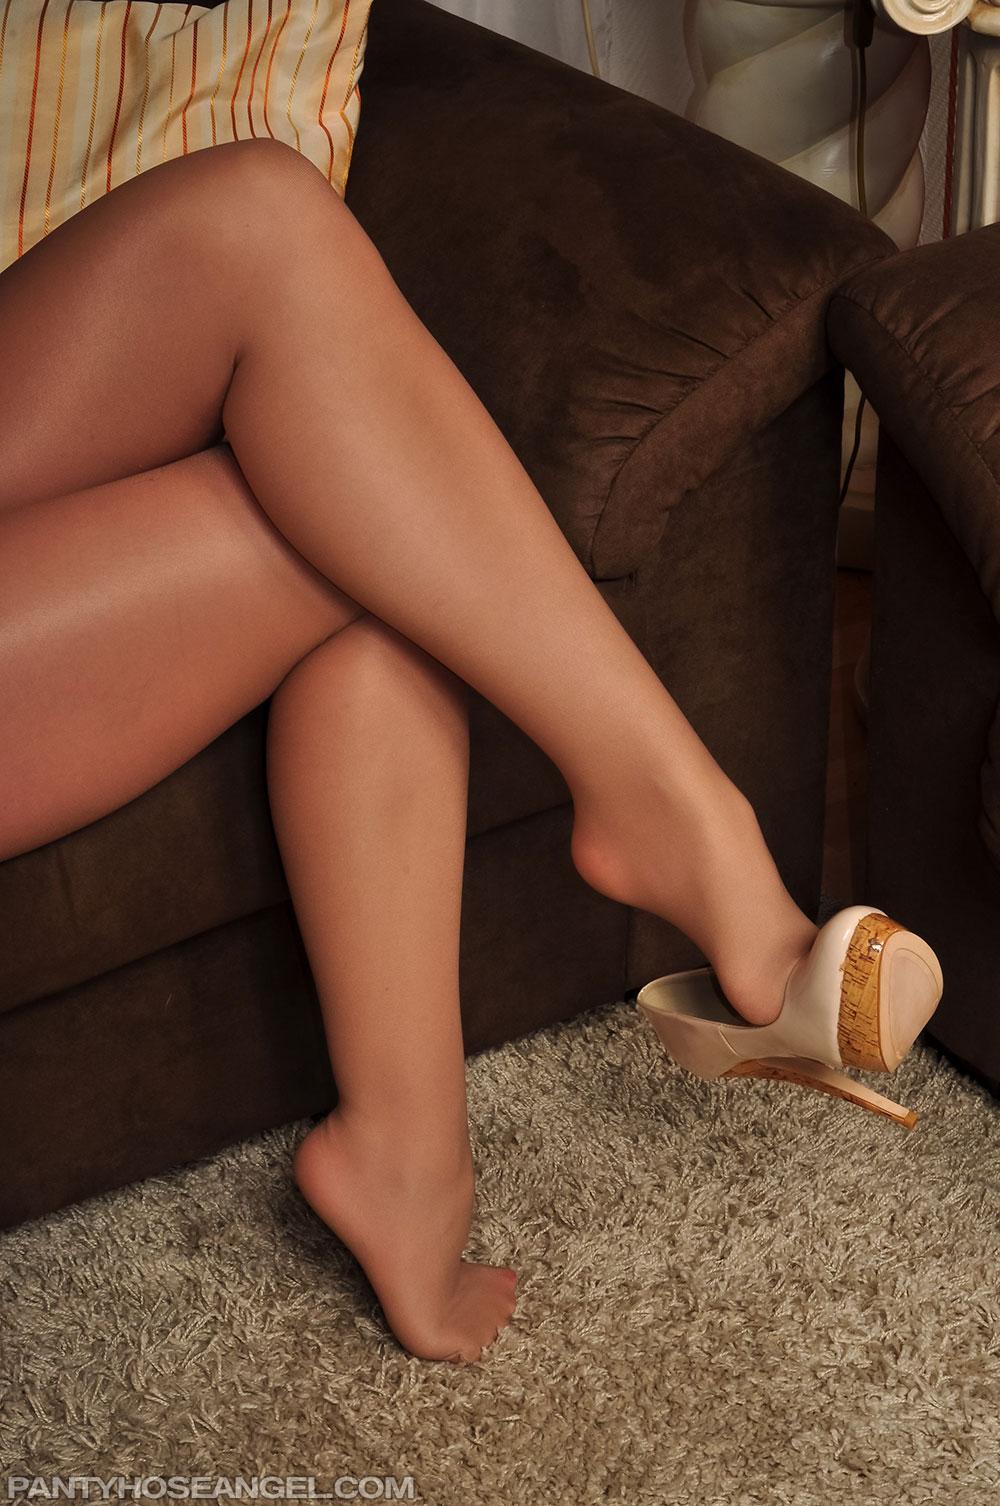 Agree with mature milf legs stockings handjob videos thick